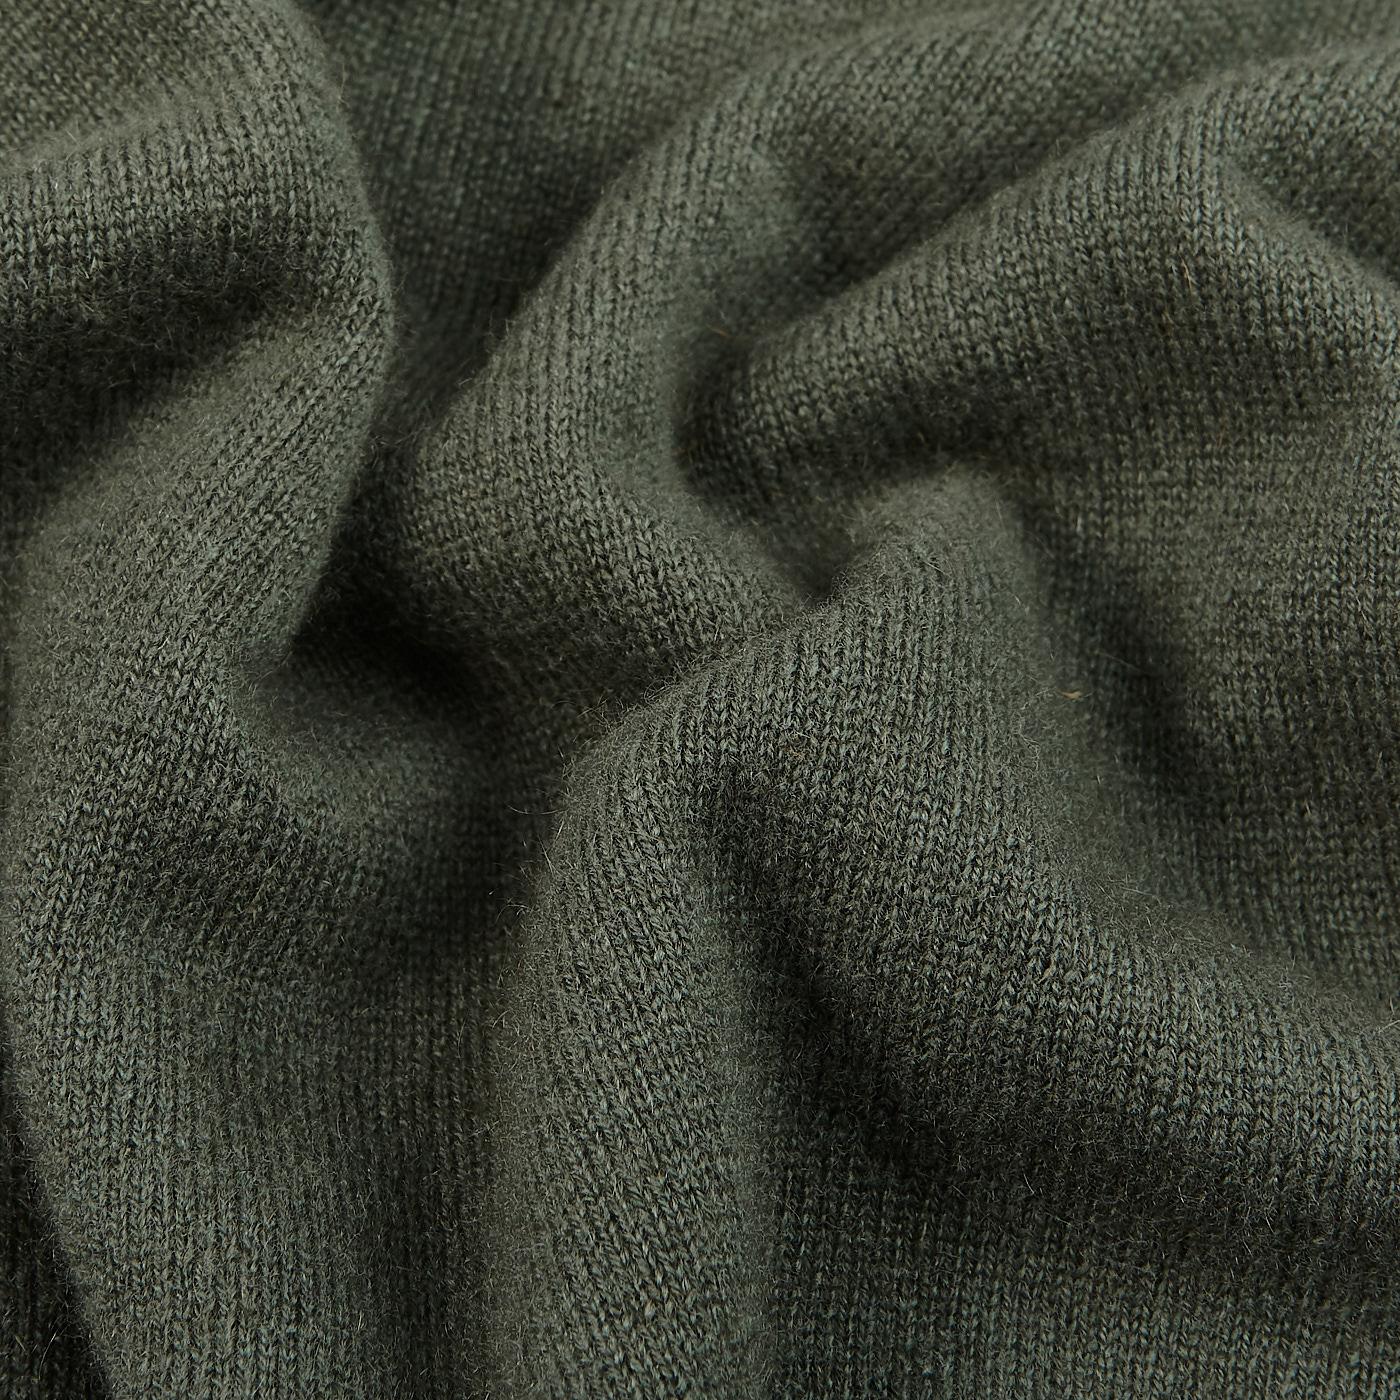 Davida Army Green Cashmere Crewneck Sweater Fabric